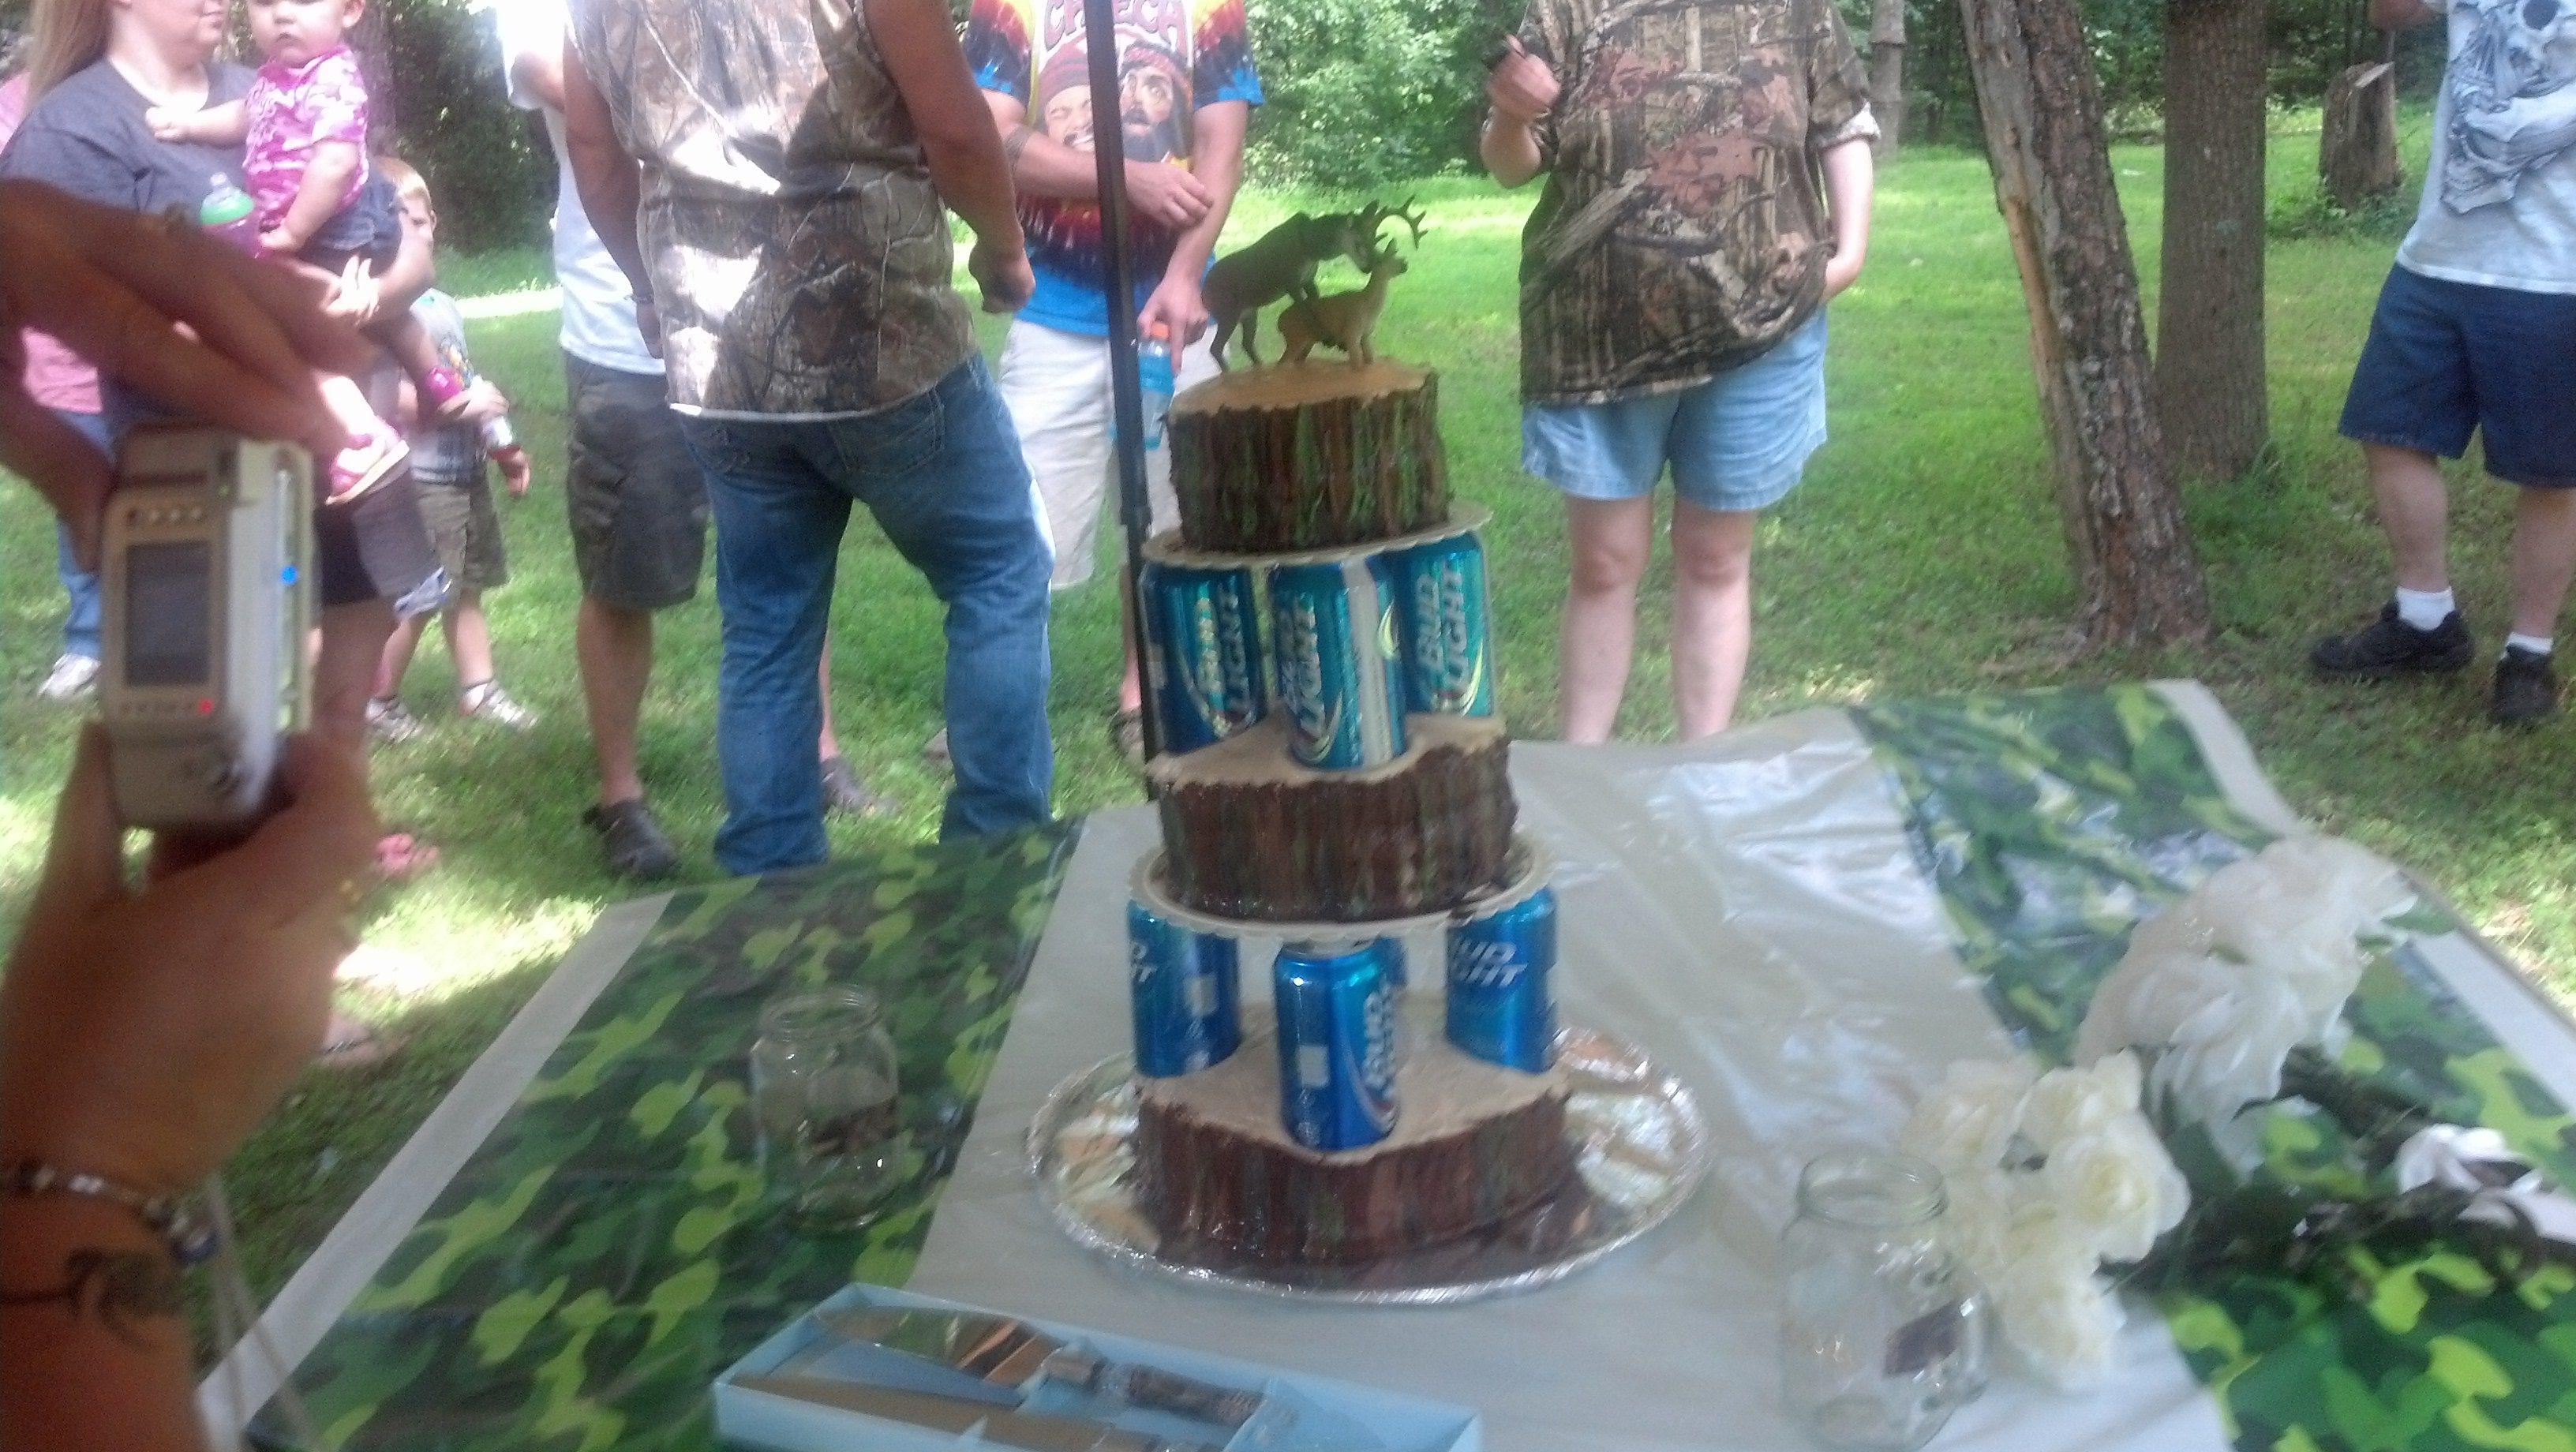 Our Redneck Wedding Cake